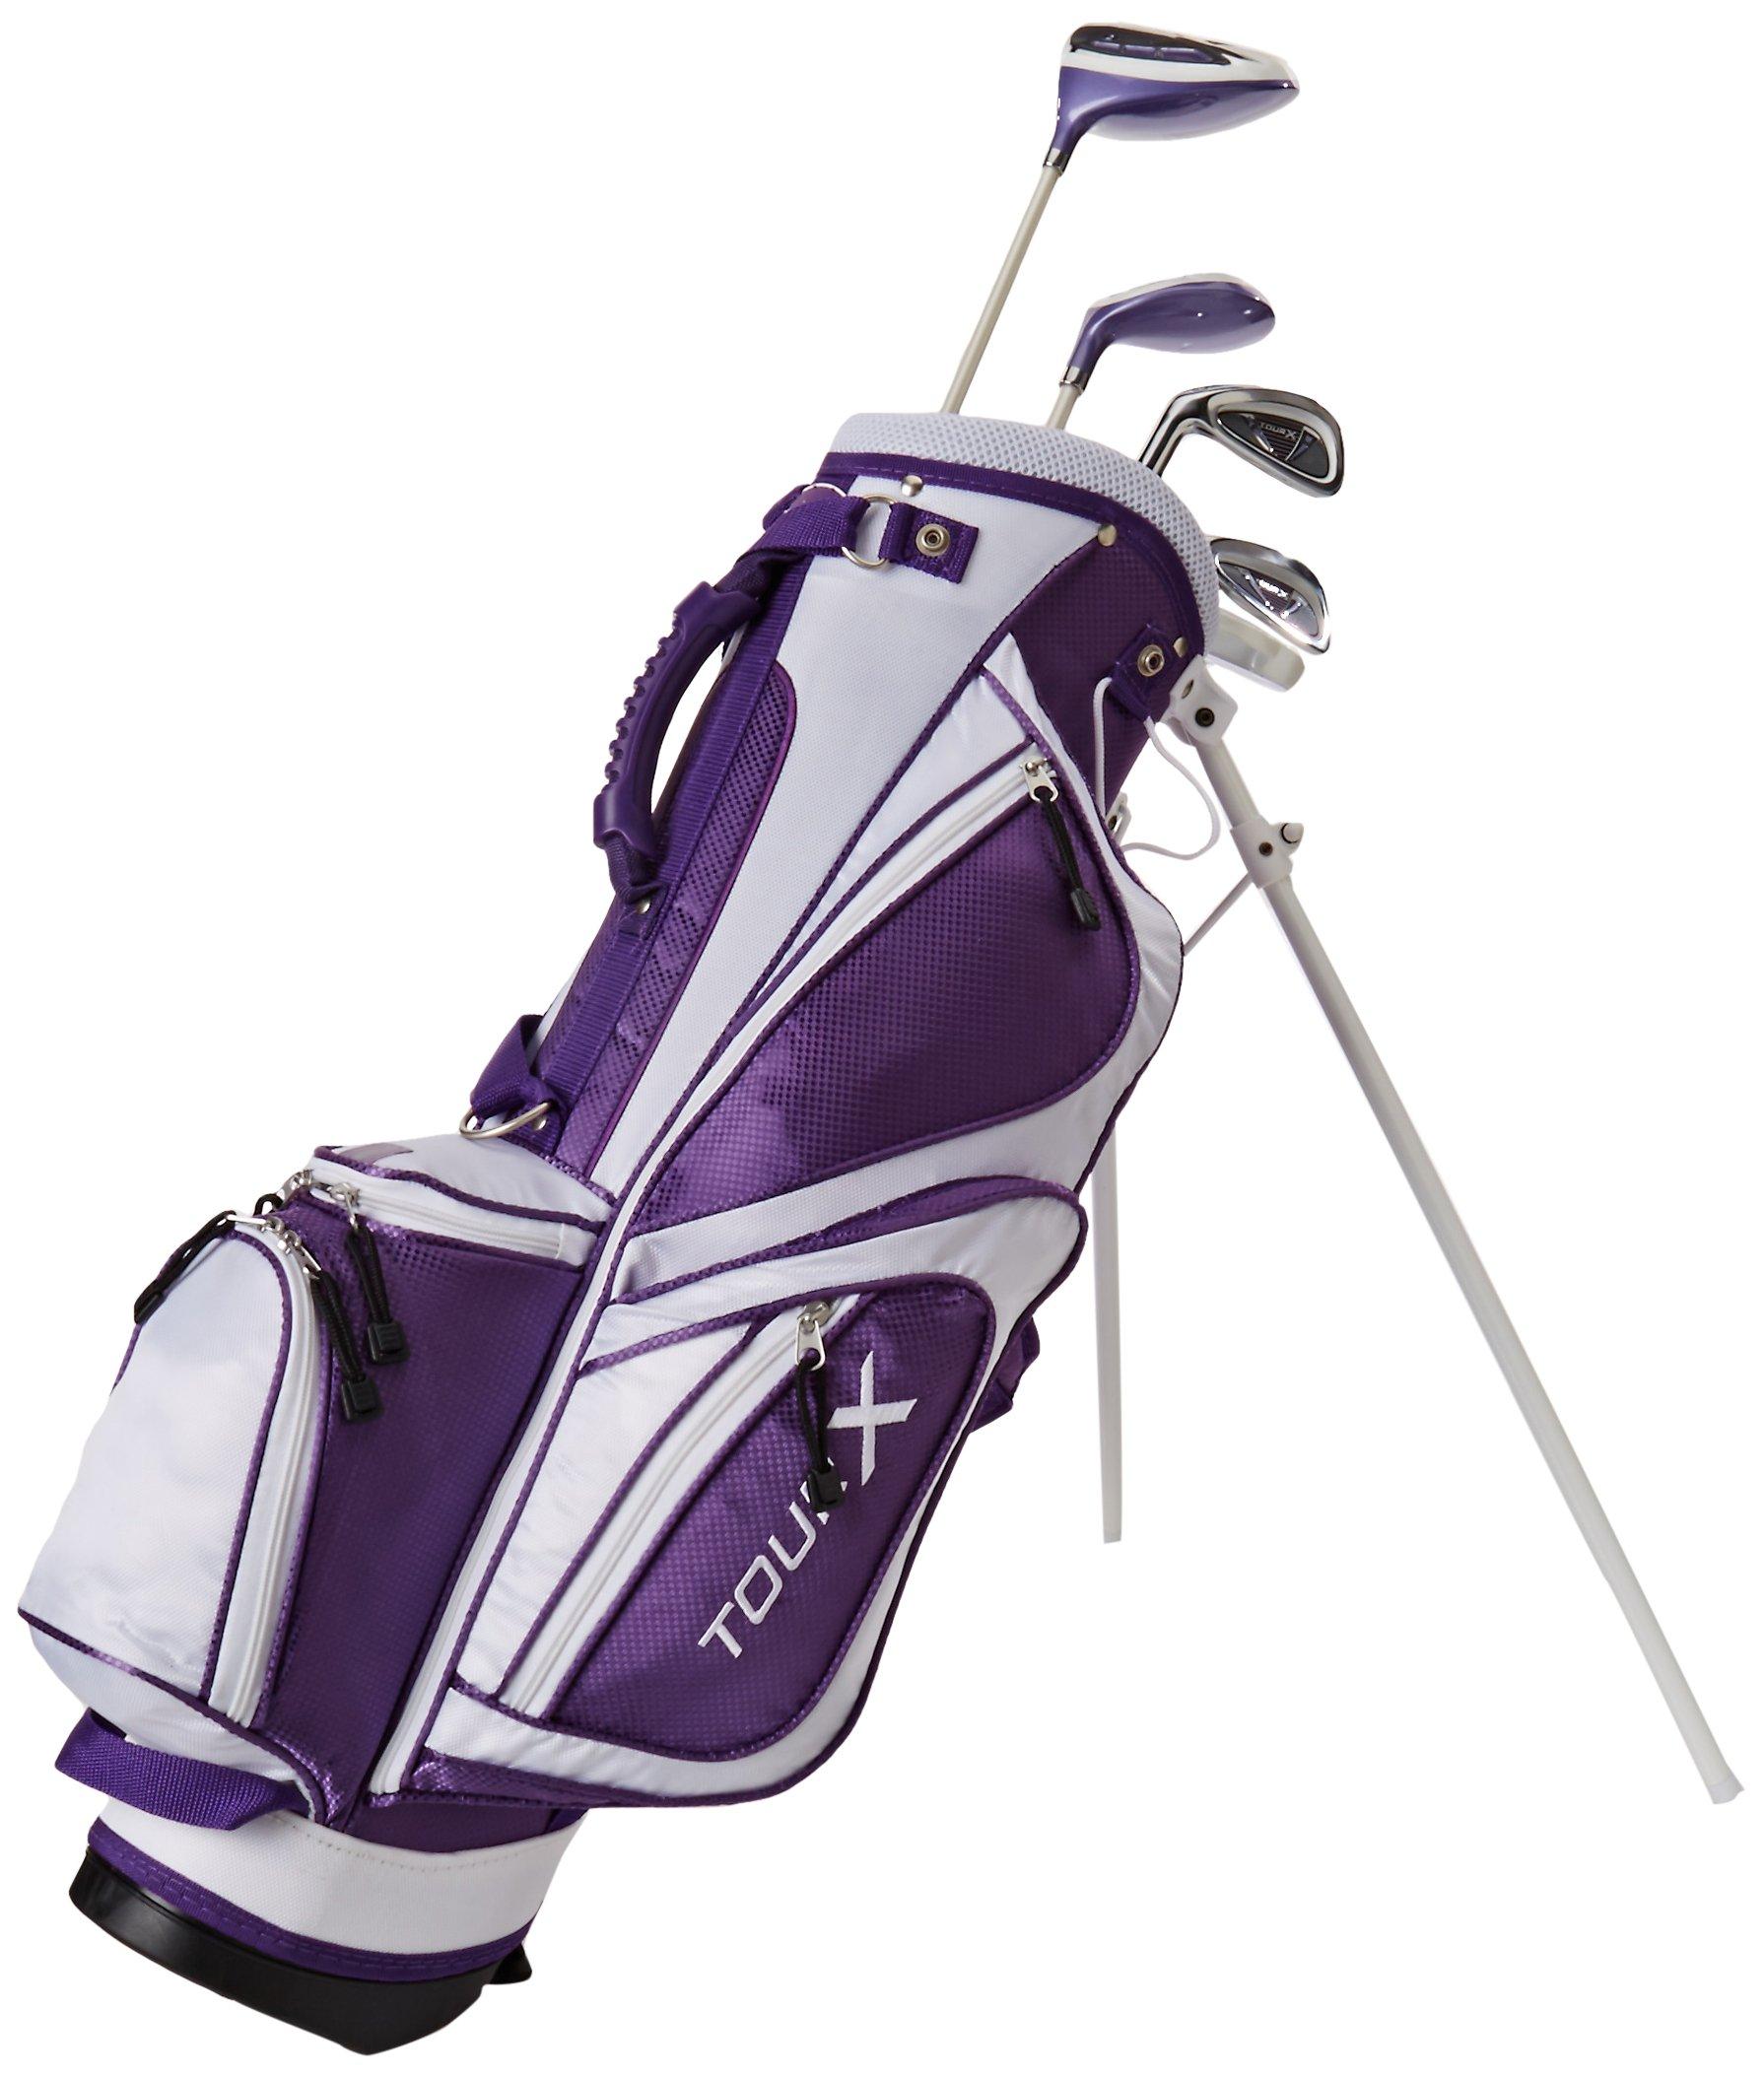 Merchants of Golf Tour X Purple 5-Piece Junior Golf Complete Set with Stand Bag, Left Hand, 8-11 Age, Graphite, Regular